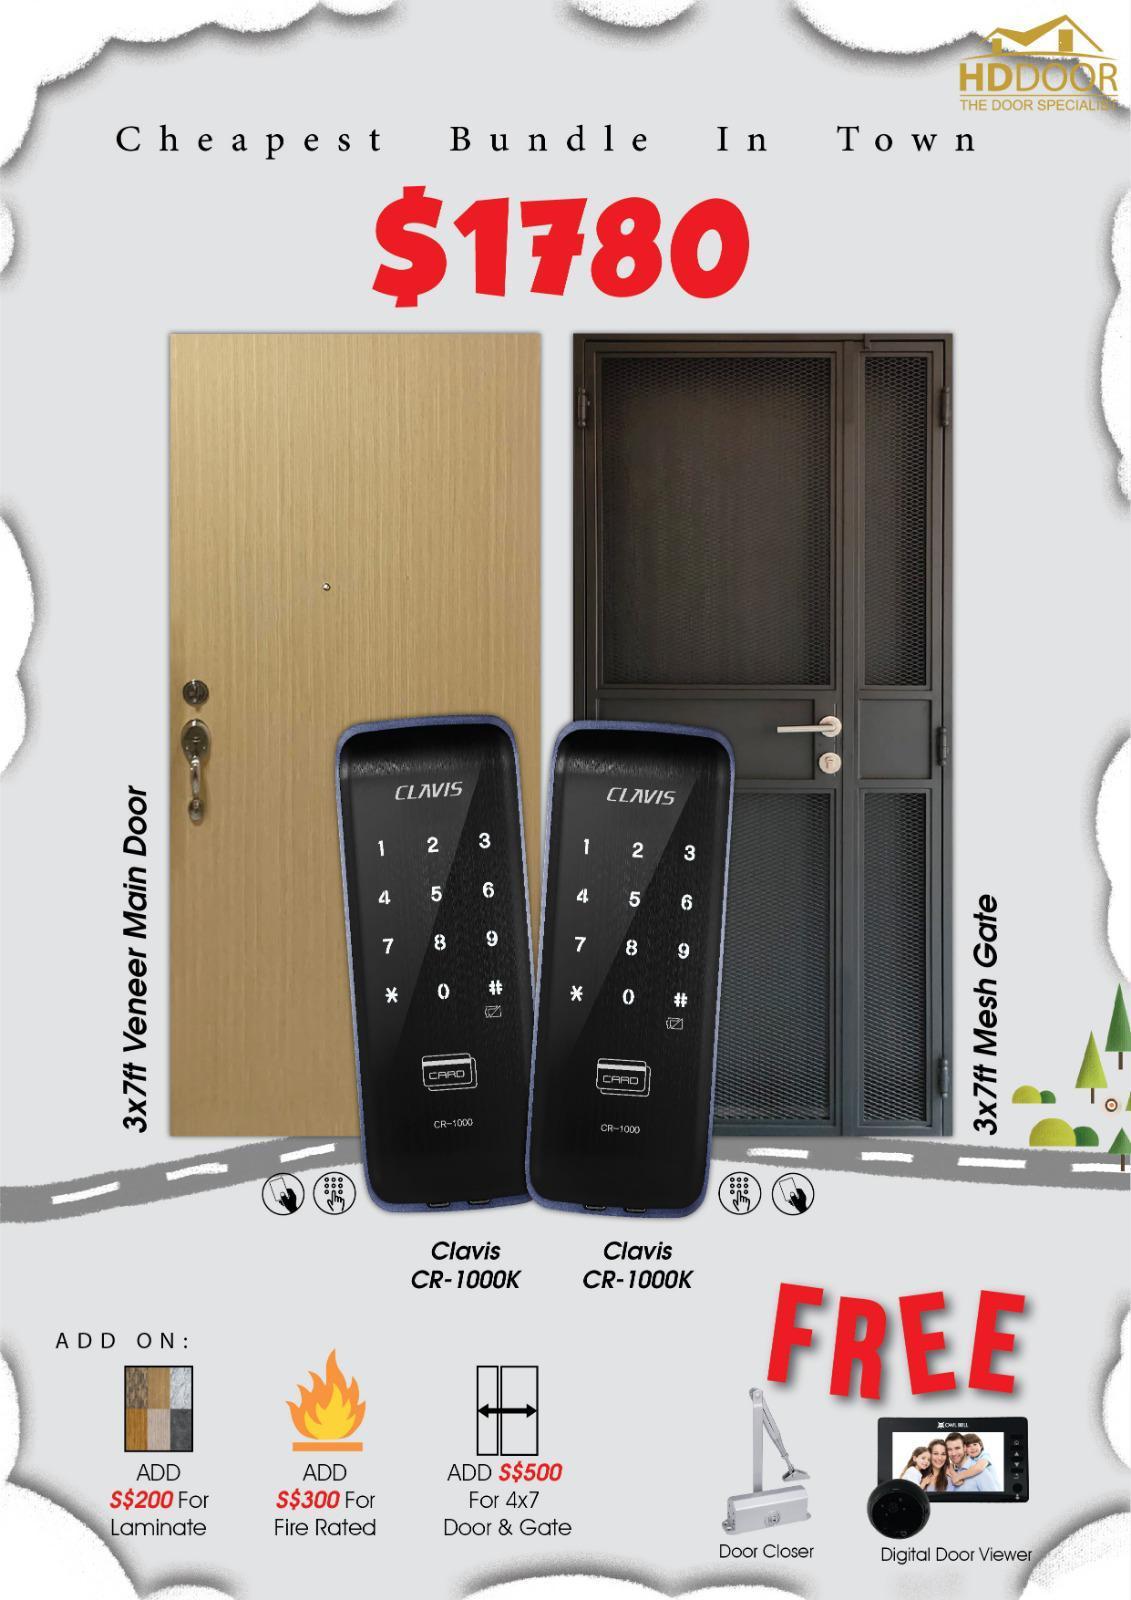 Cheapest Bundle Promotion 2020 | Why Not Deals 4 & Promotions